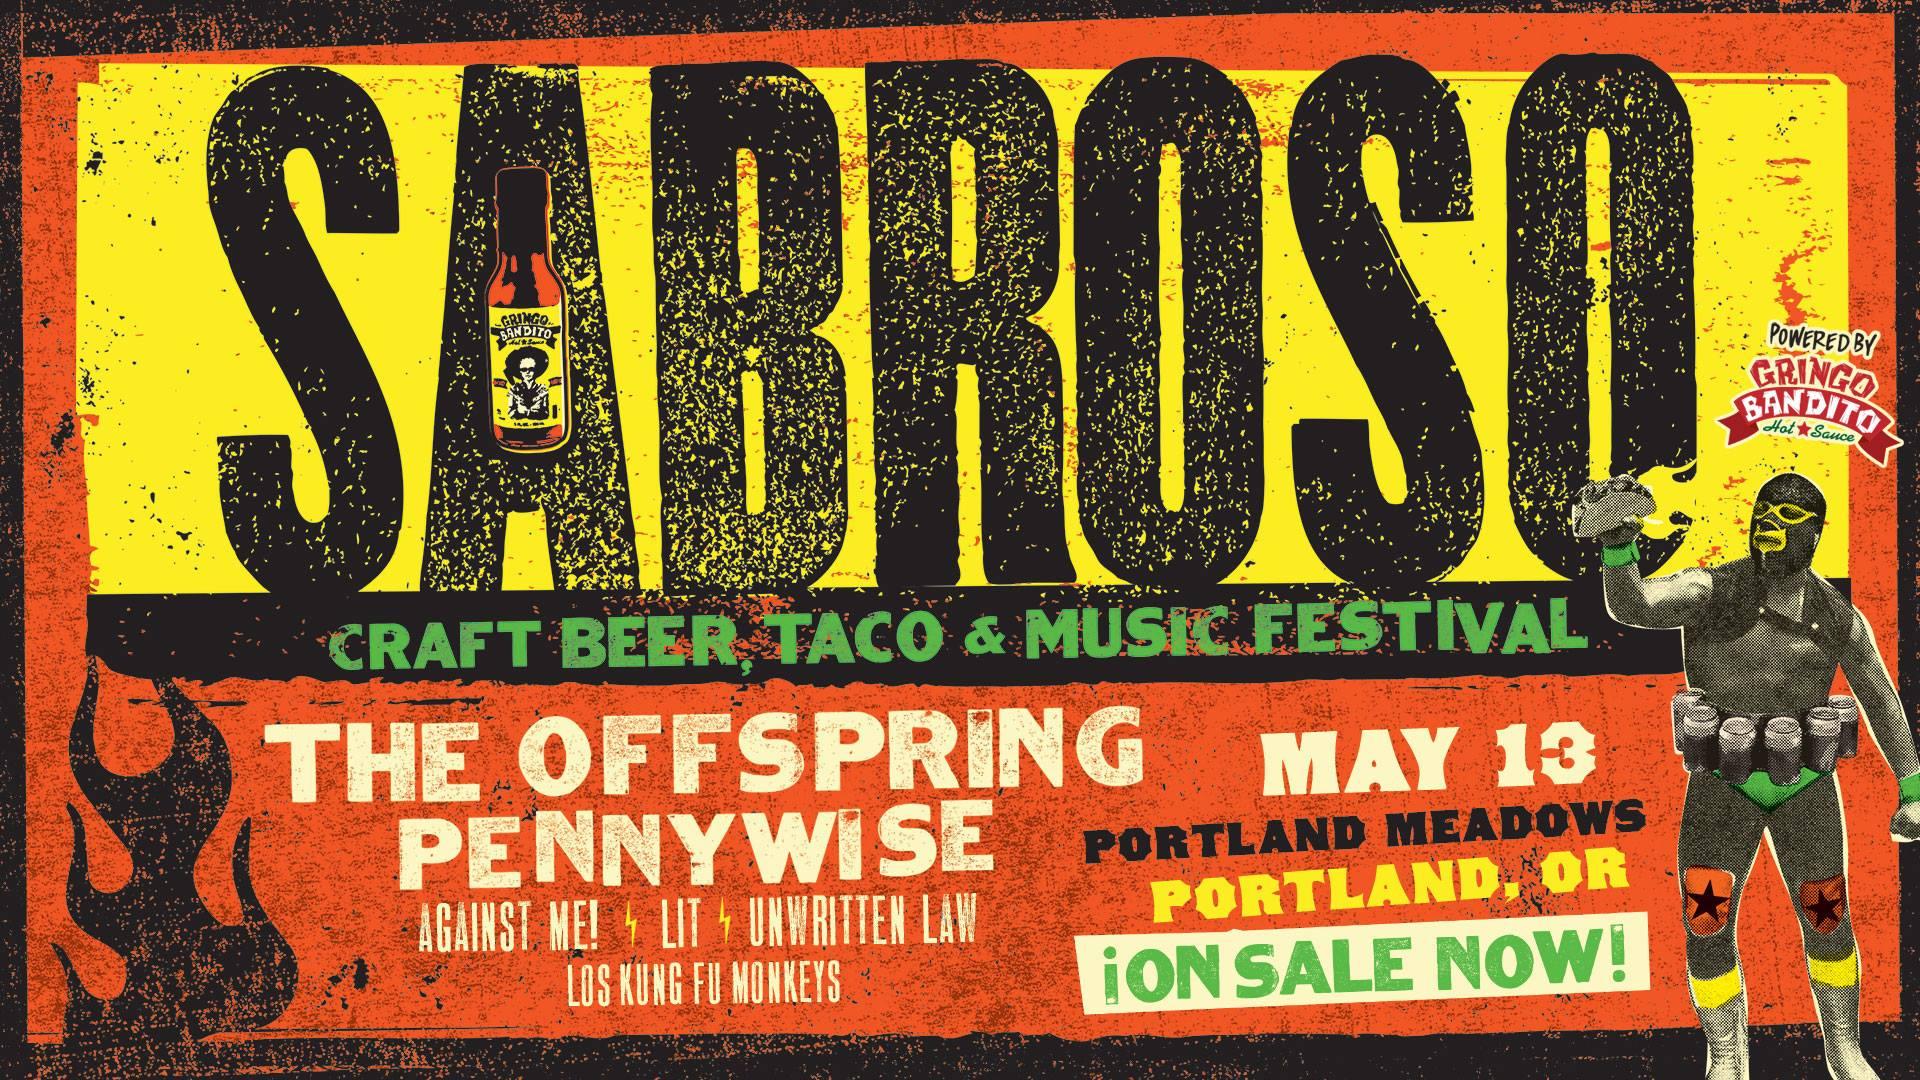 Sabroso Craft Beer, Taco & Music Festival - Portland, Oregon - May 13, 2018